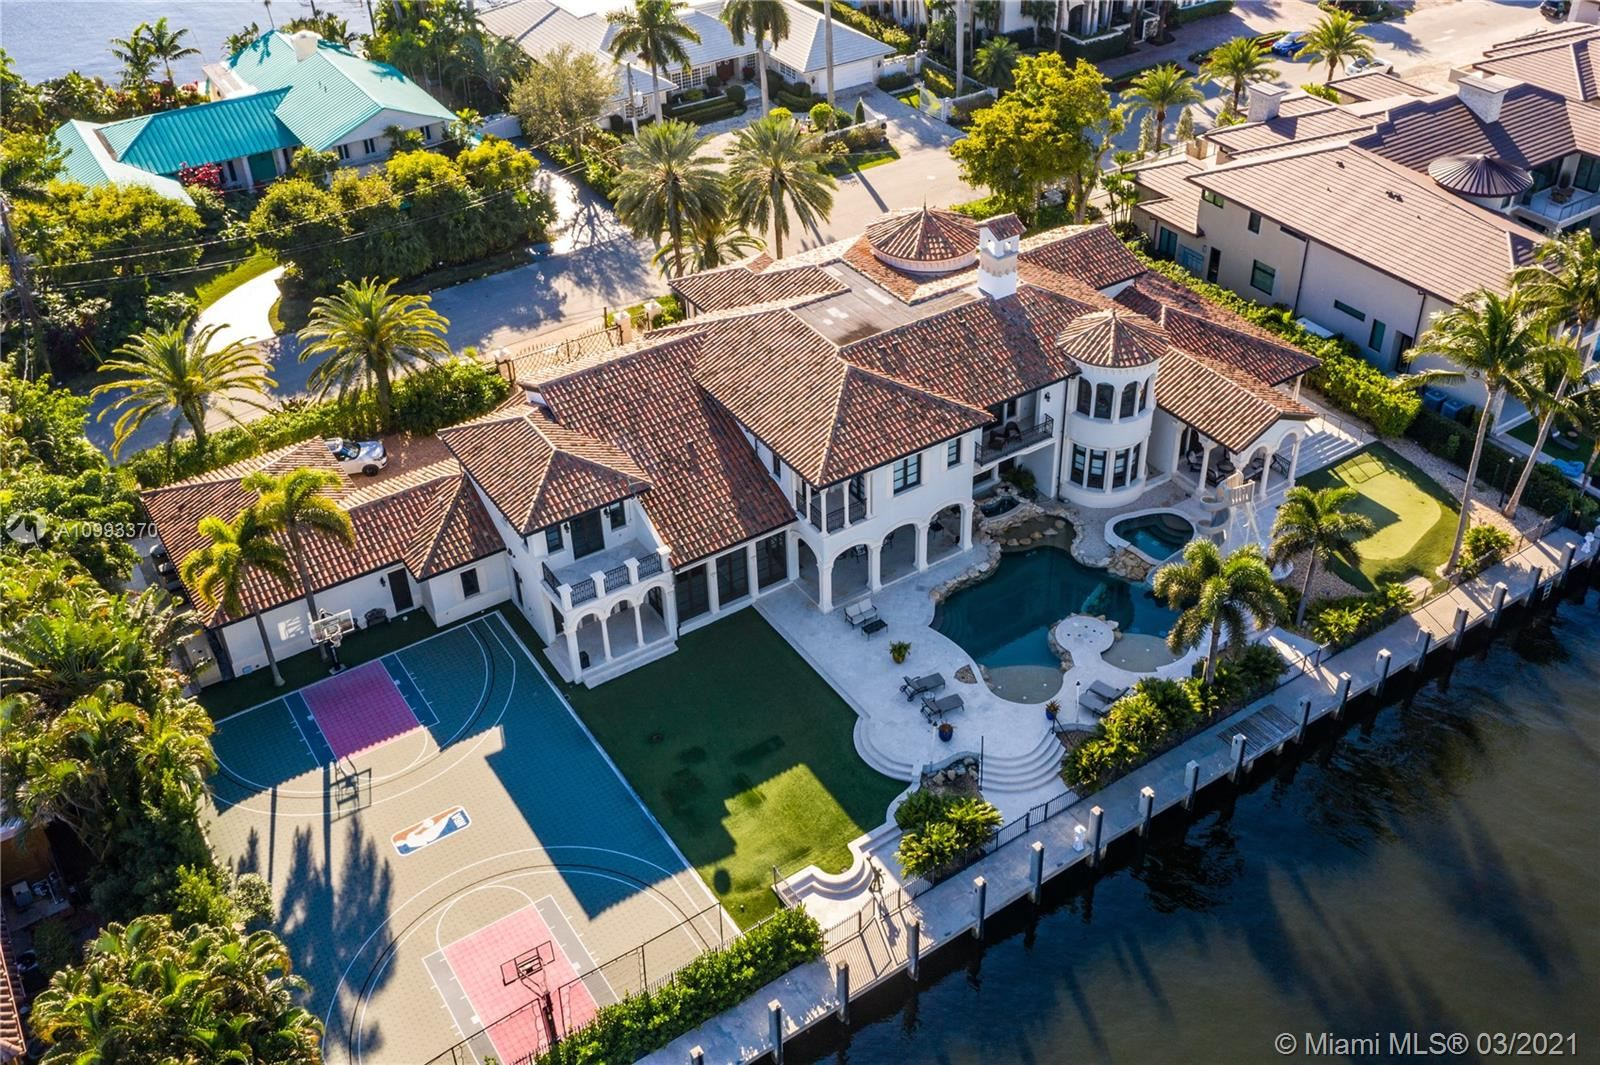 2571 Del Lago Dr, Fort Lauderdale, FL 33316 - #: A10993370